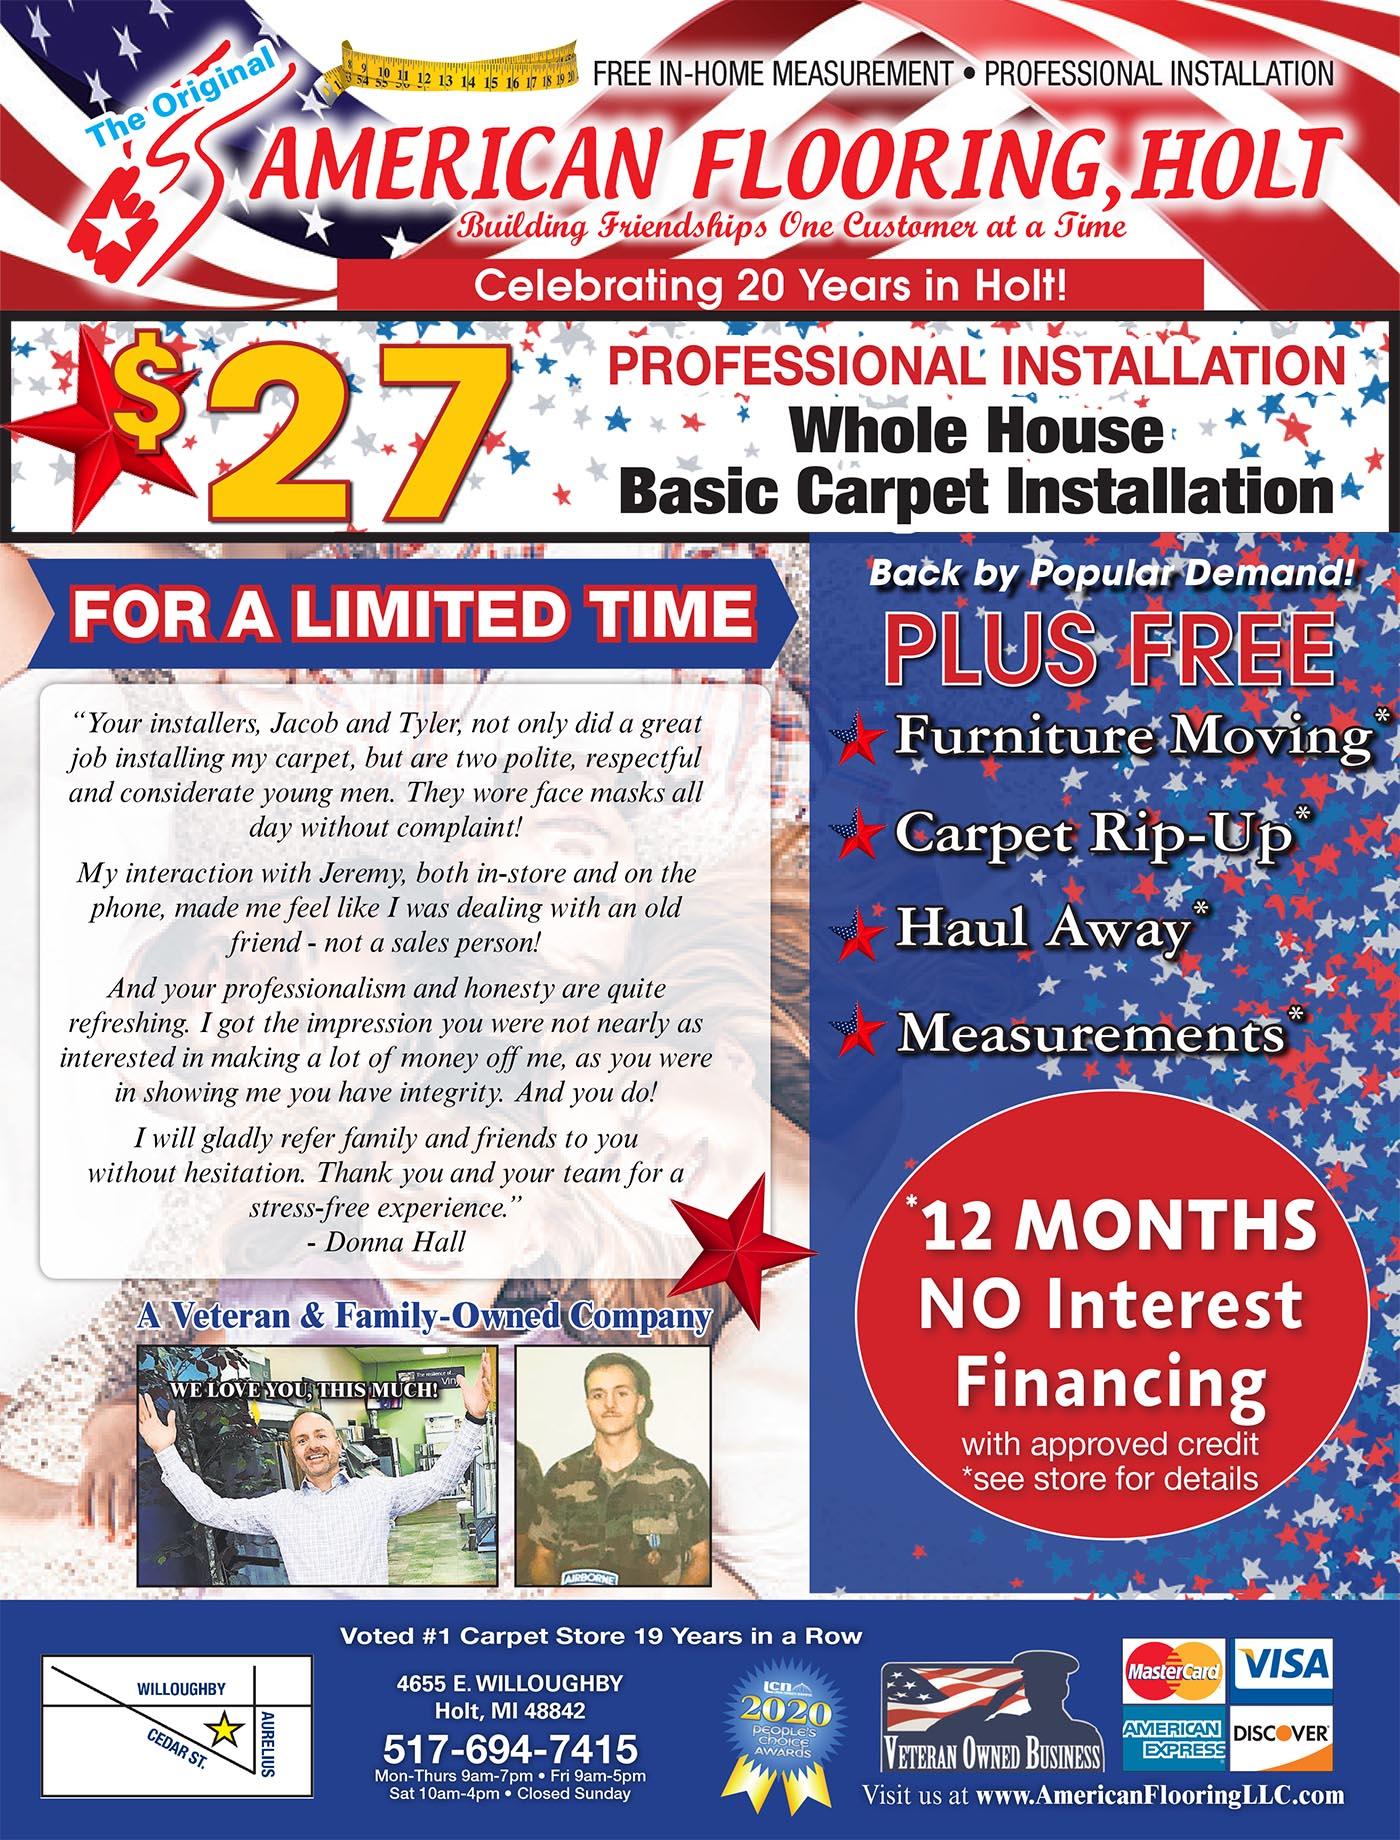 American Flooring Holt sales flyer